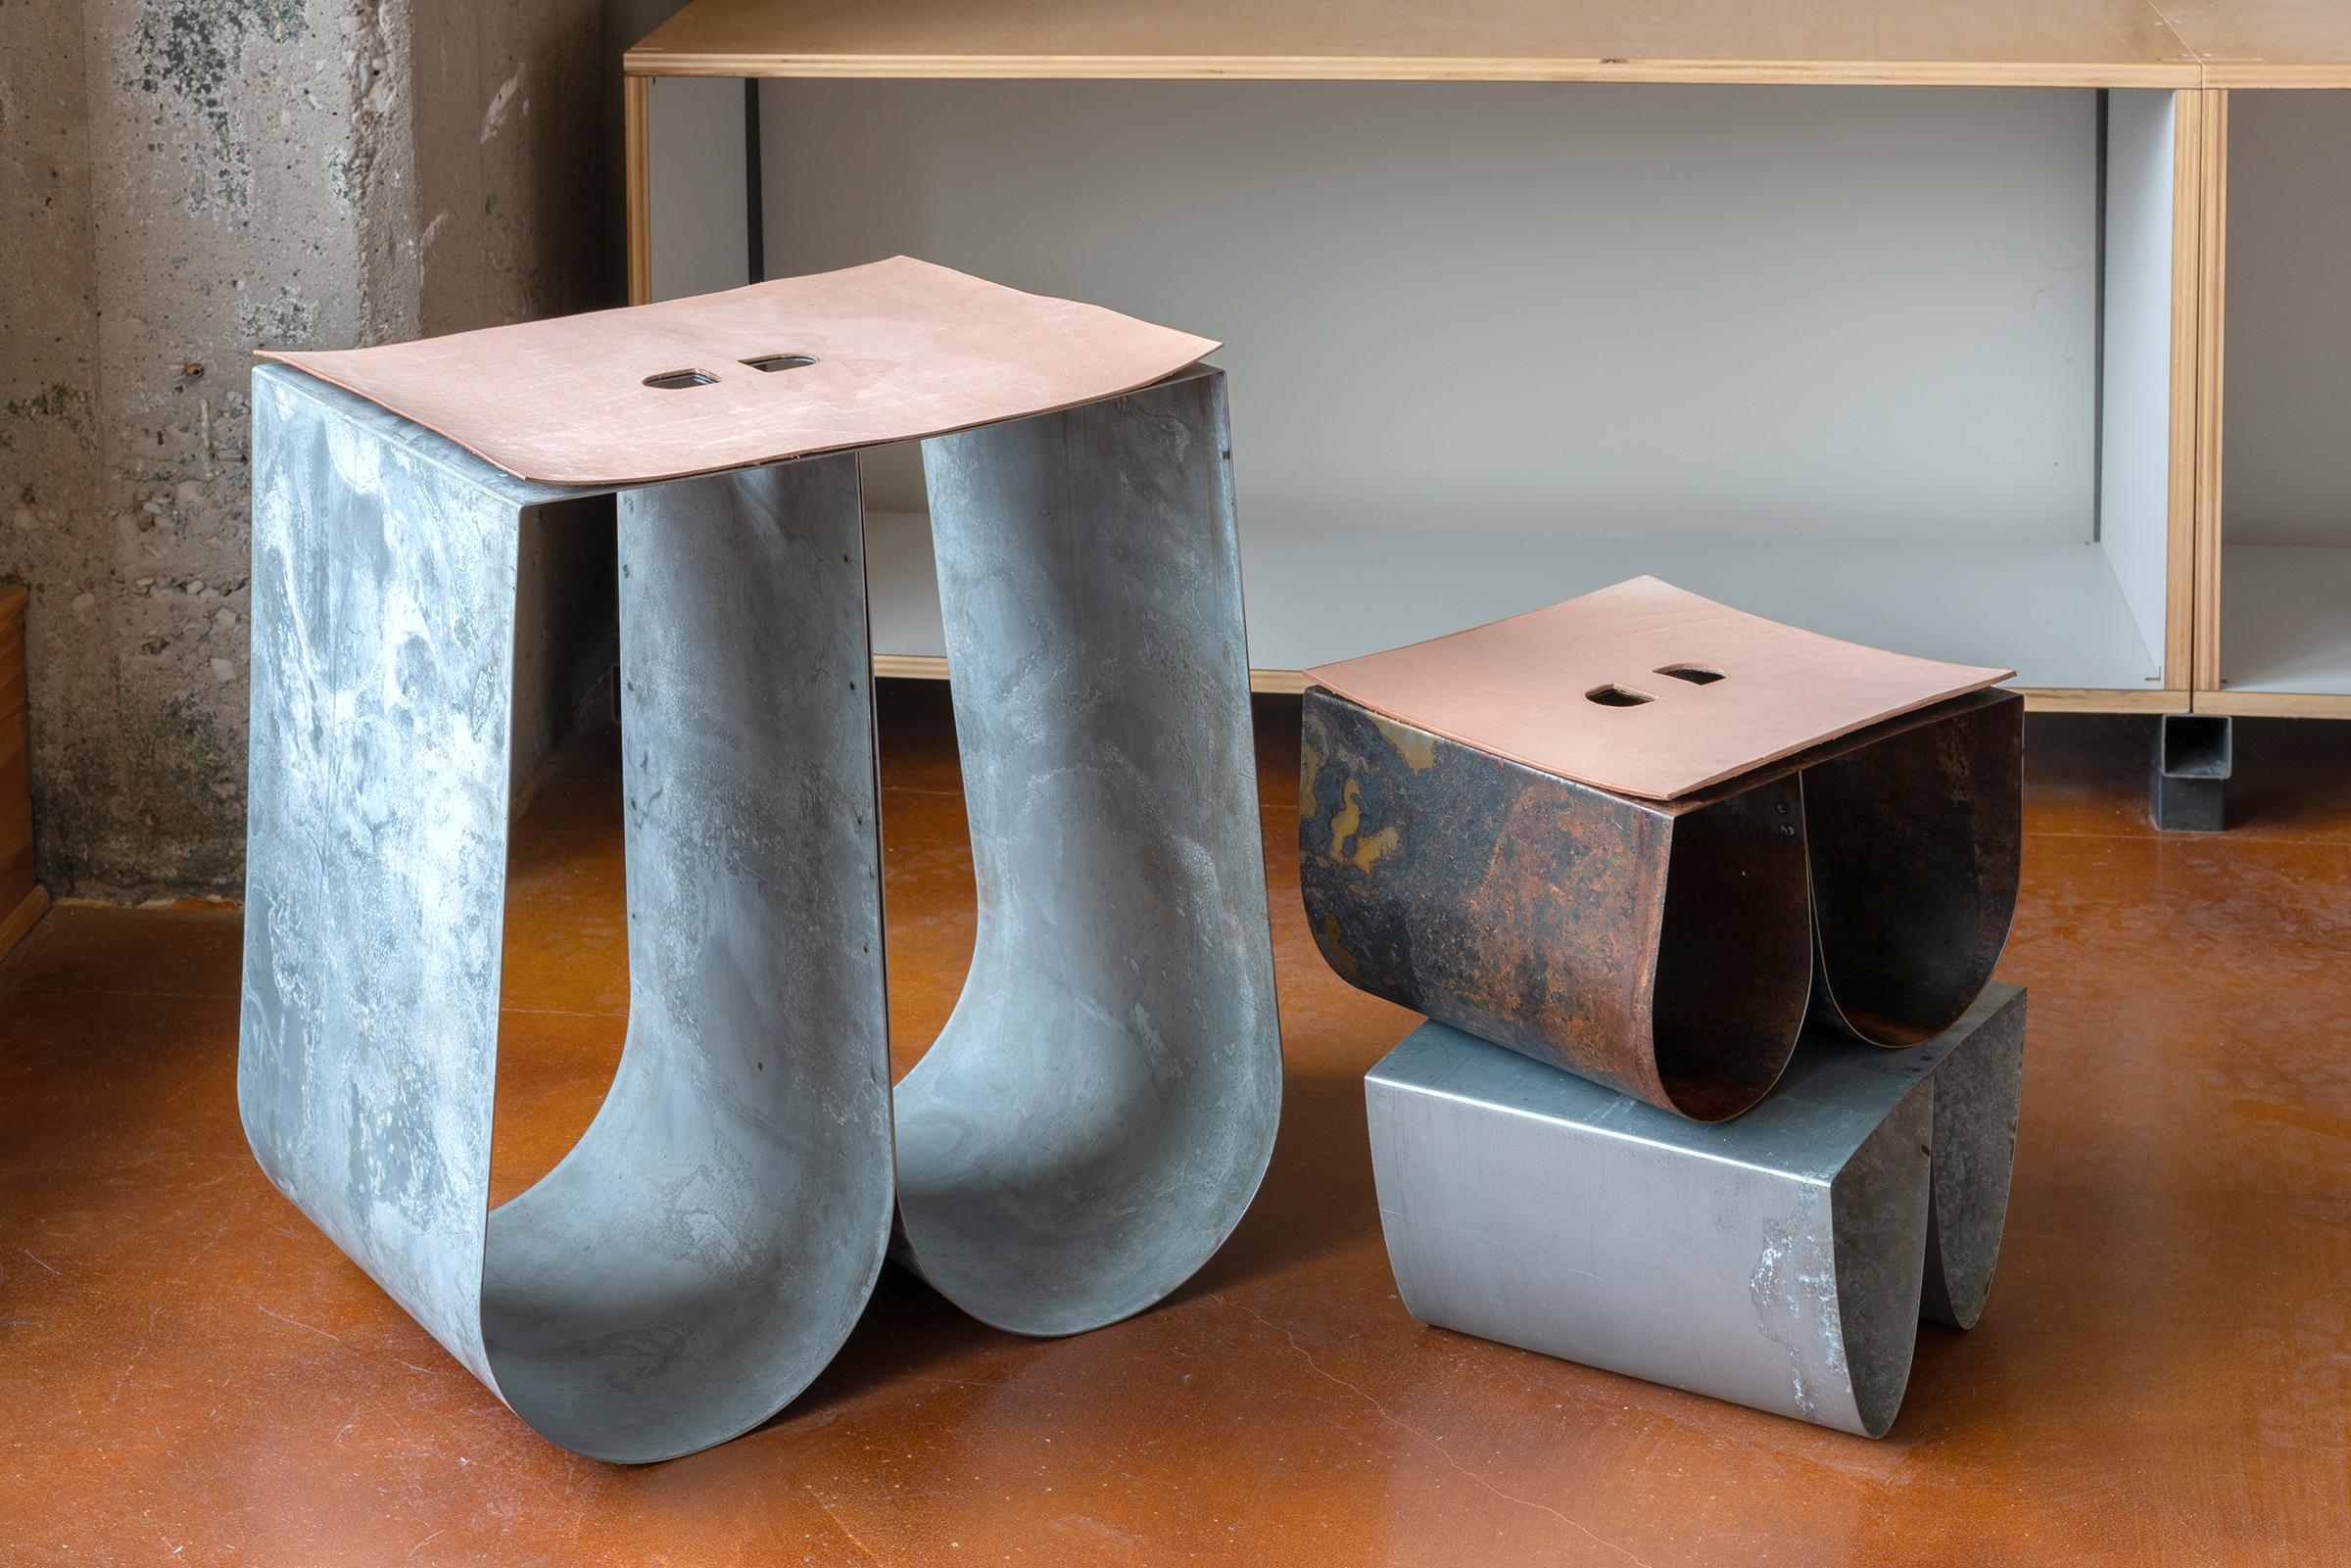 Tranberg_stools